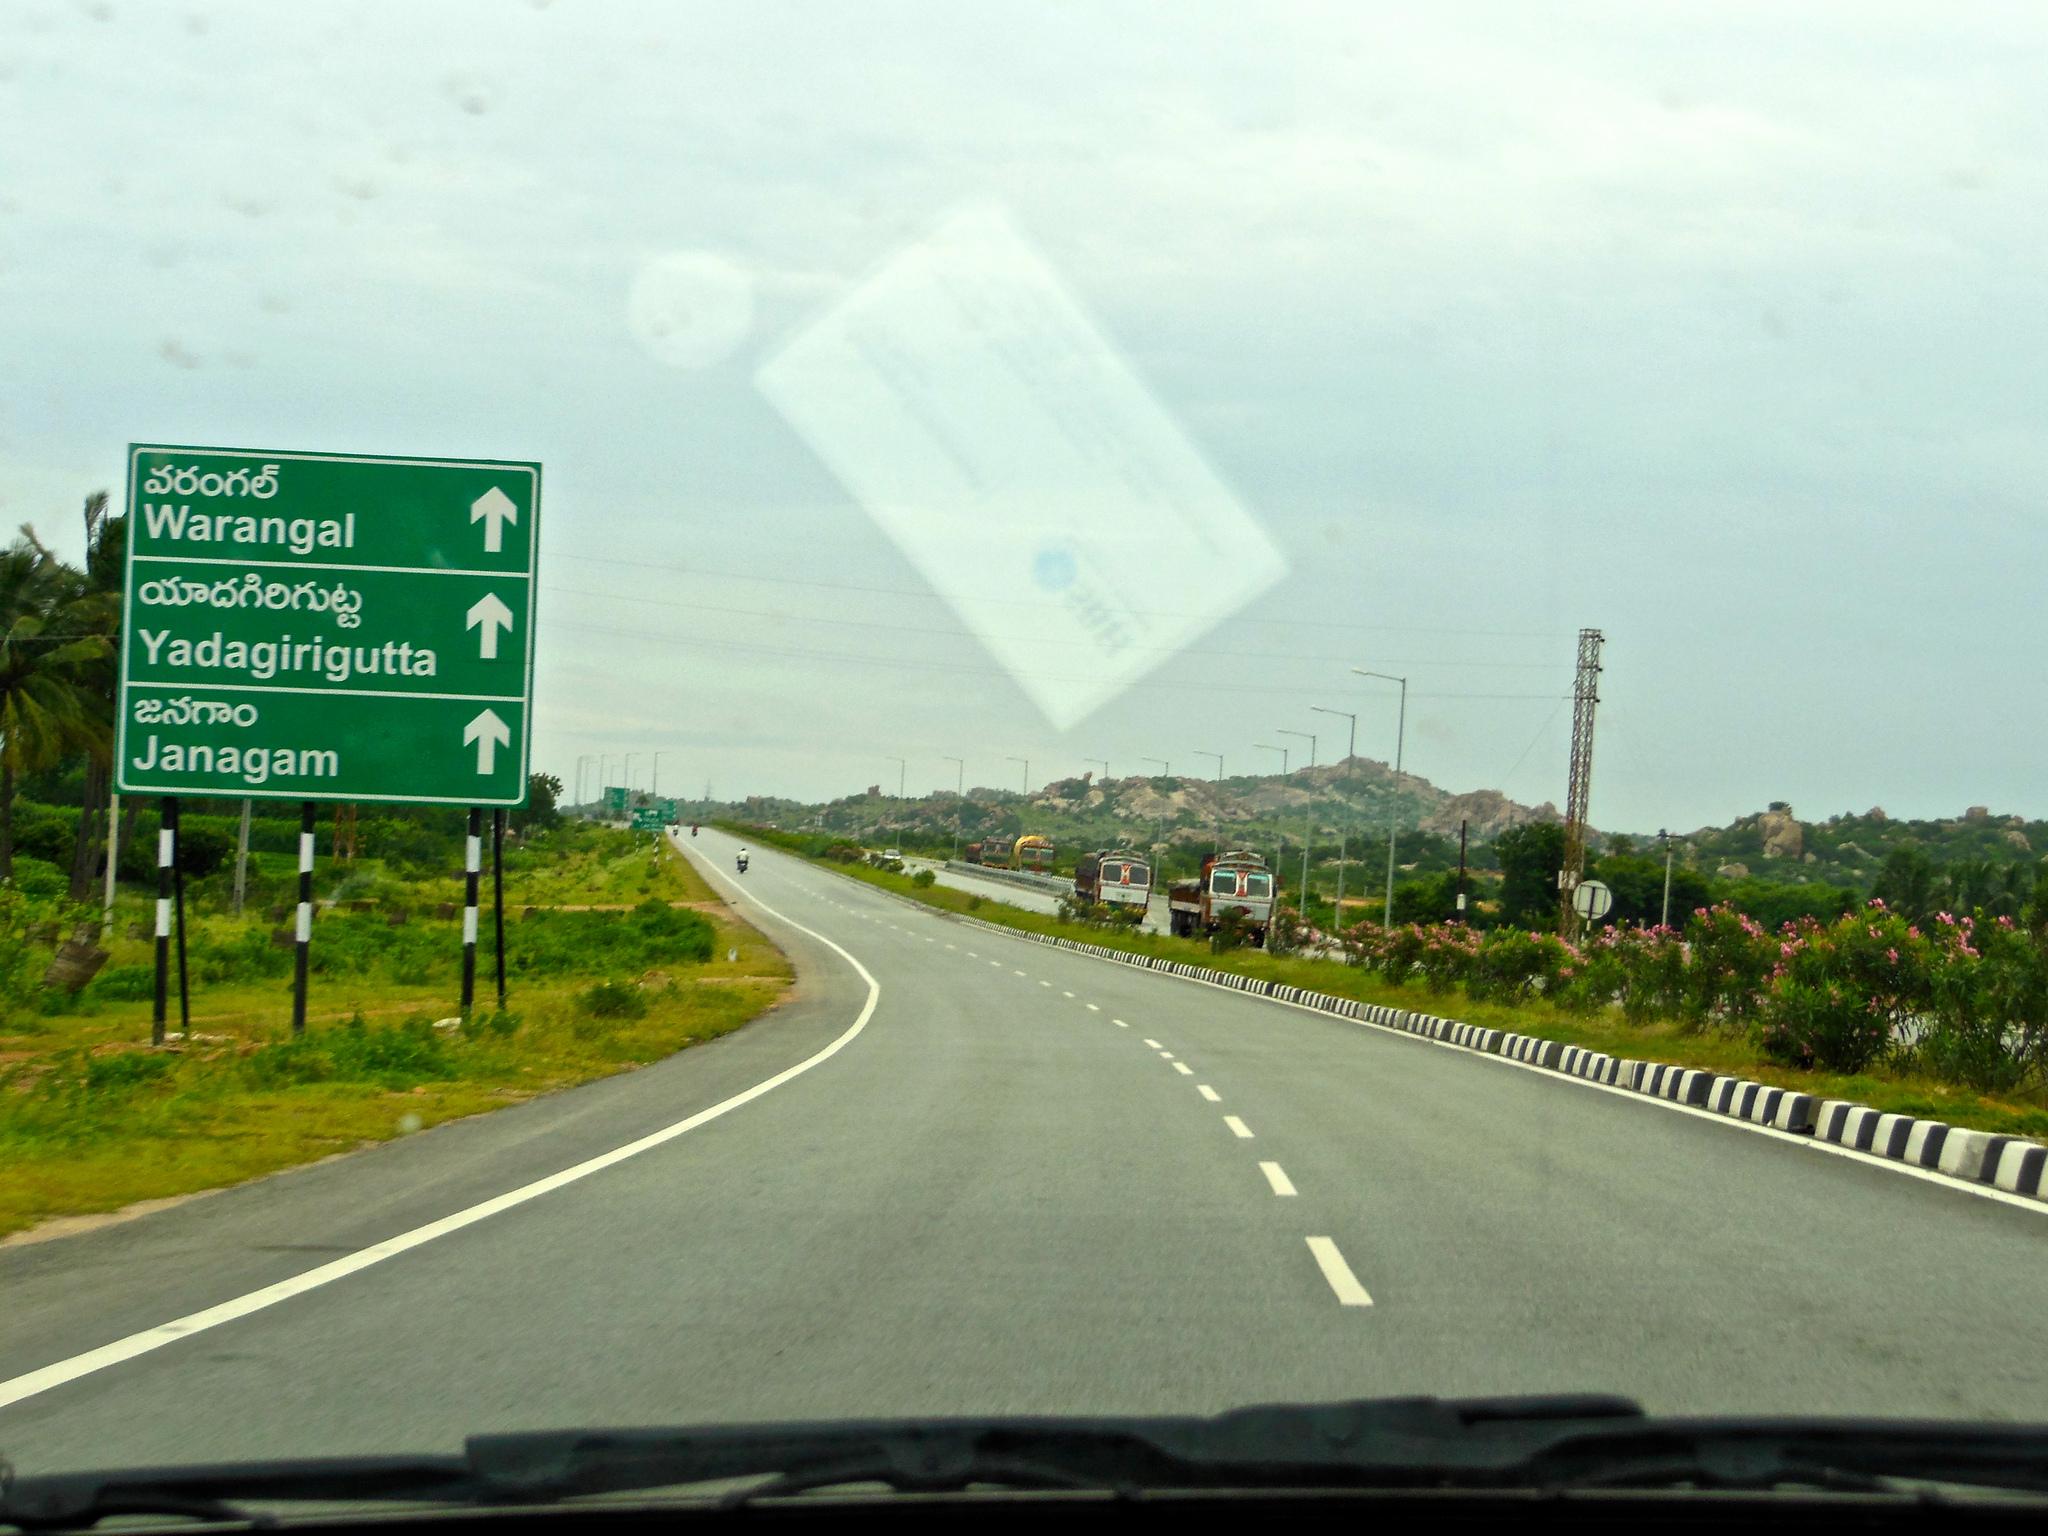 Dileep Eduri Warangal Highway